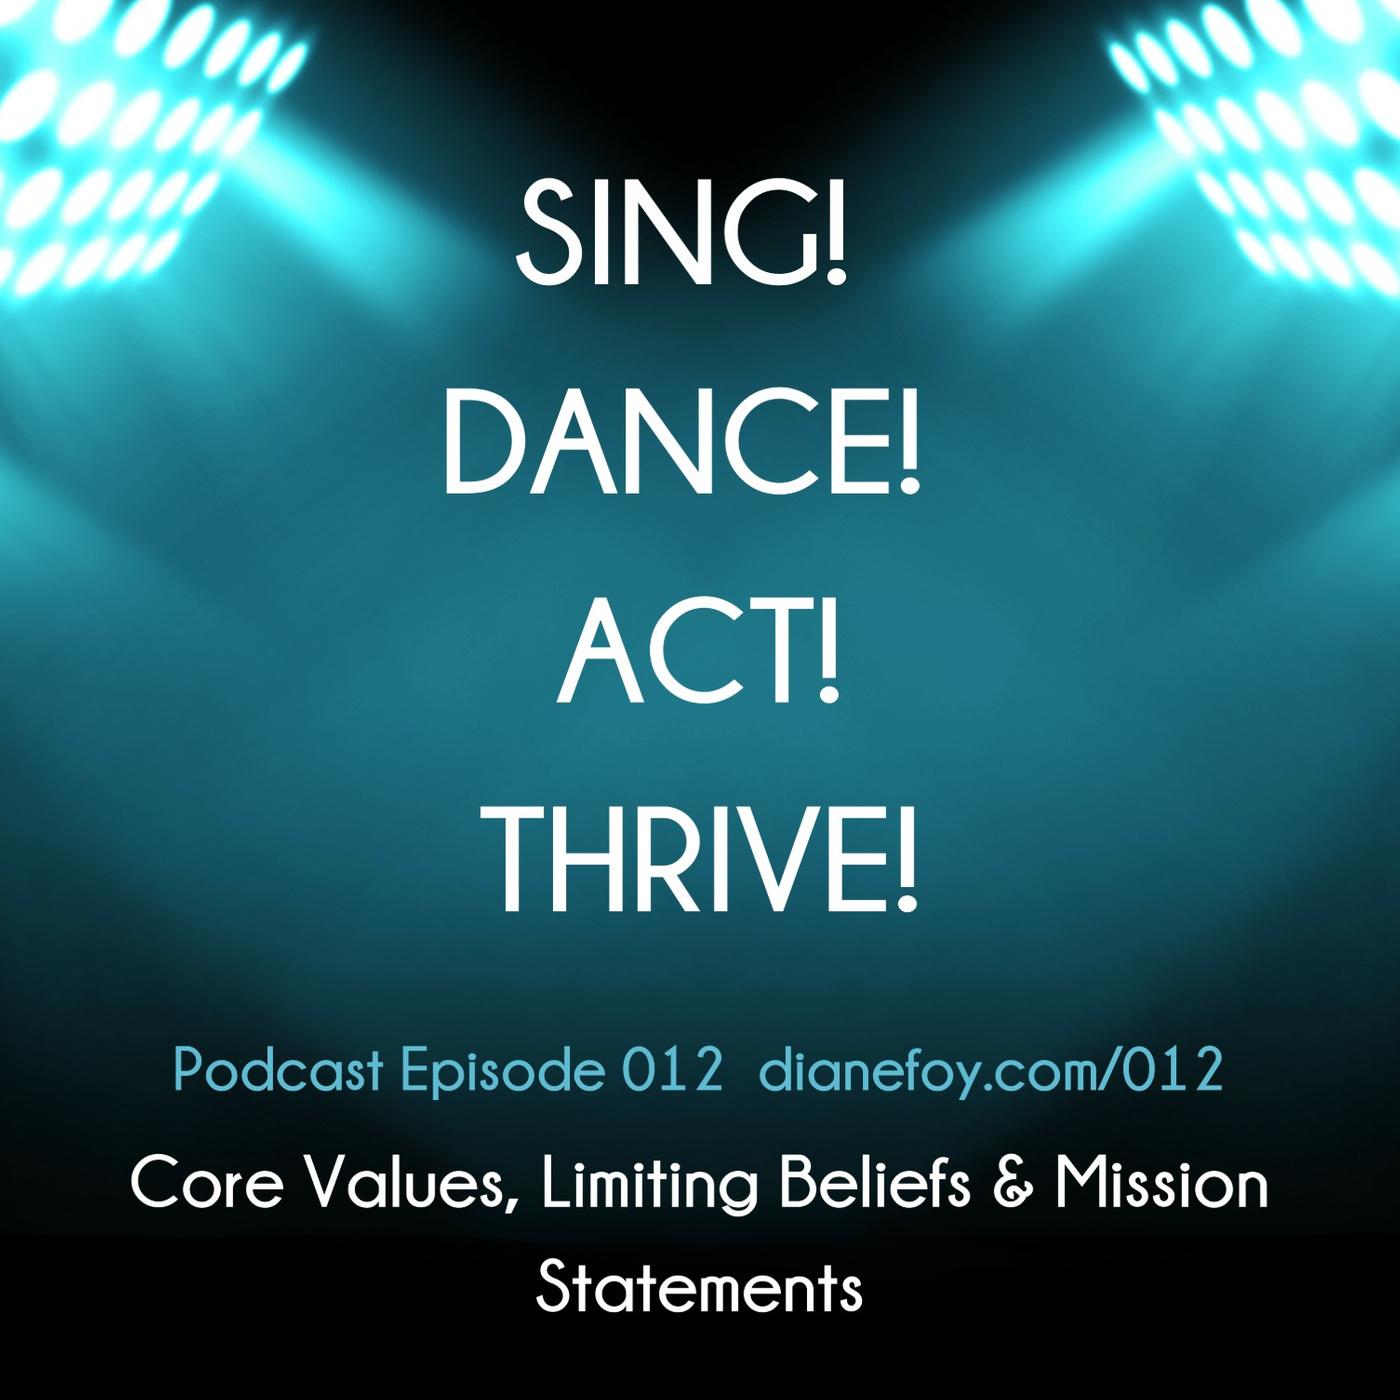 Core Values, Limiting Beliefs & Mission Statements